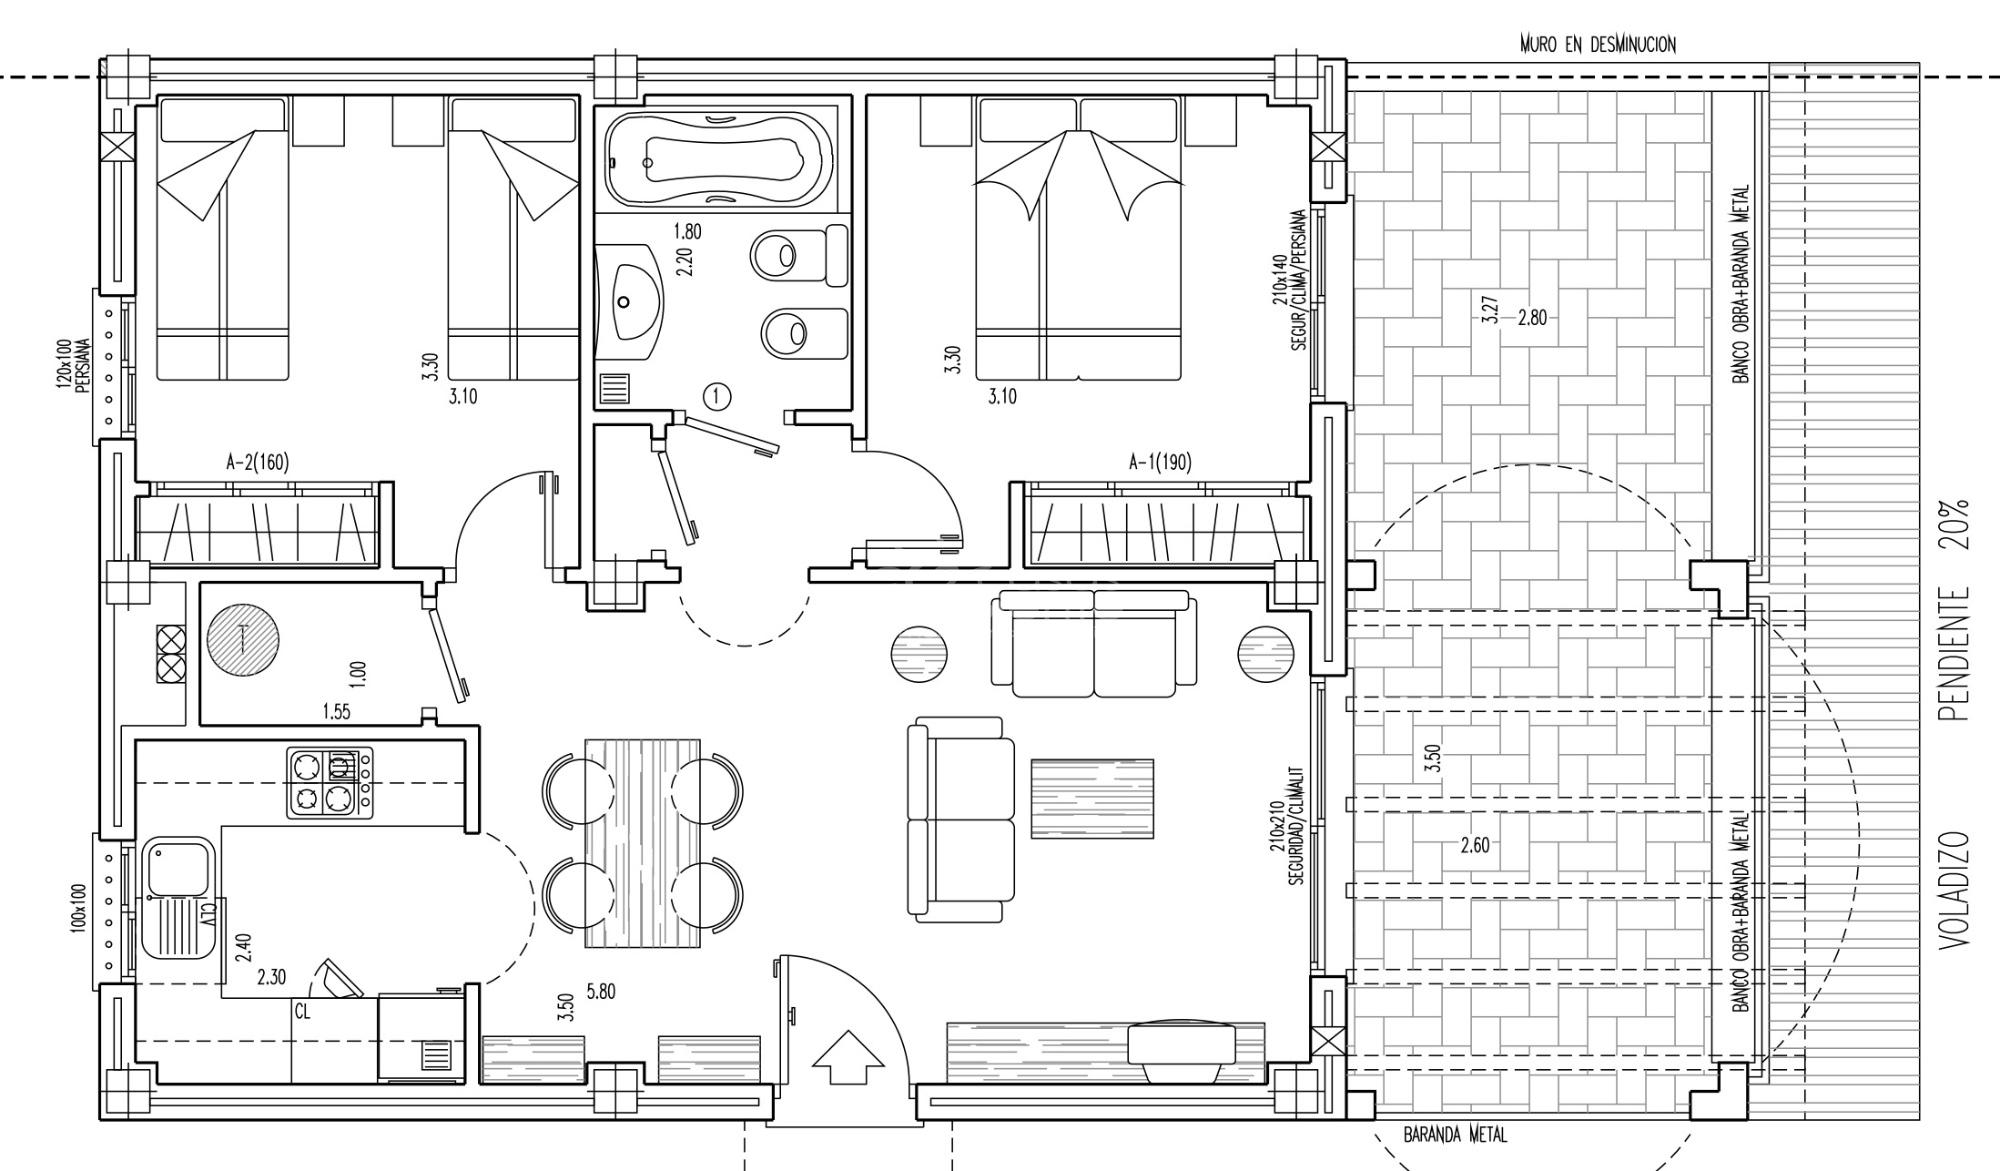 neue wohnung in benitachell cumbre del sol. Black Bedroom Furniture Sets. Home Design Ideas